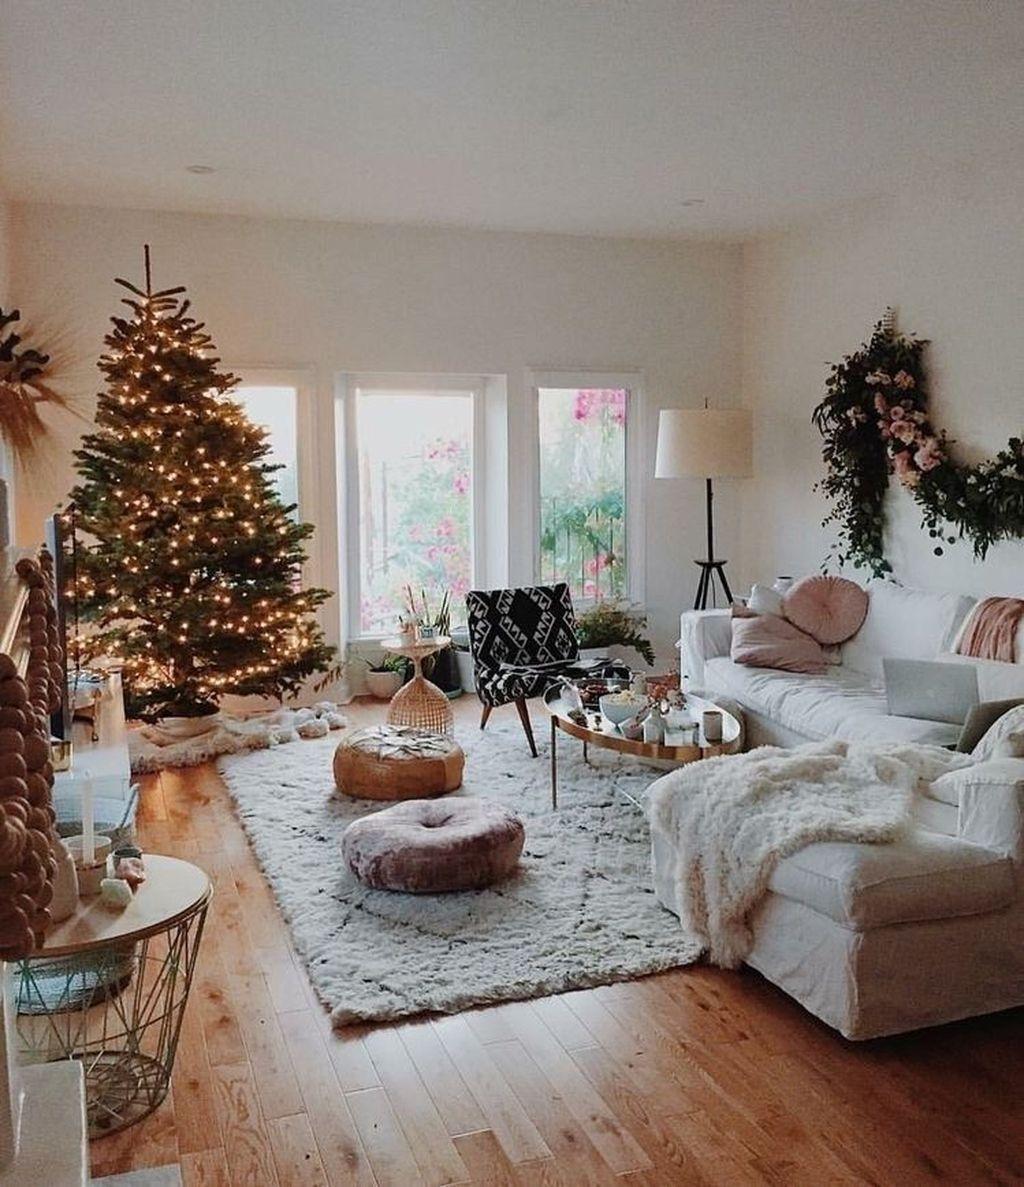 33 Small Apartment Christmas Decor Ideas - #Apartment #christmas #decor #ideas #Small #smallapartmentchristmasdecor